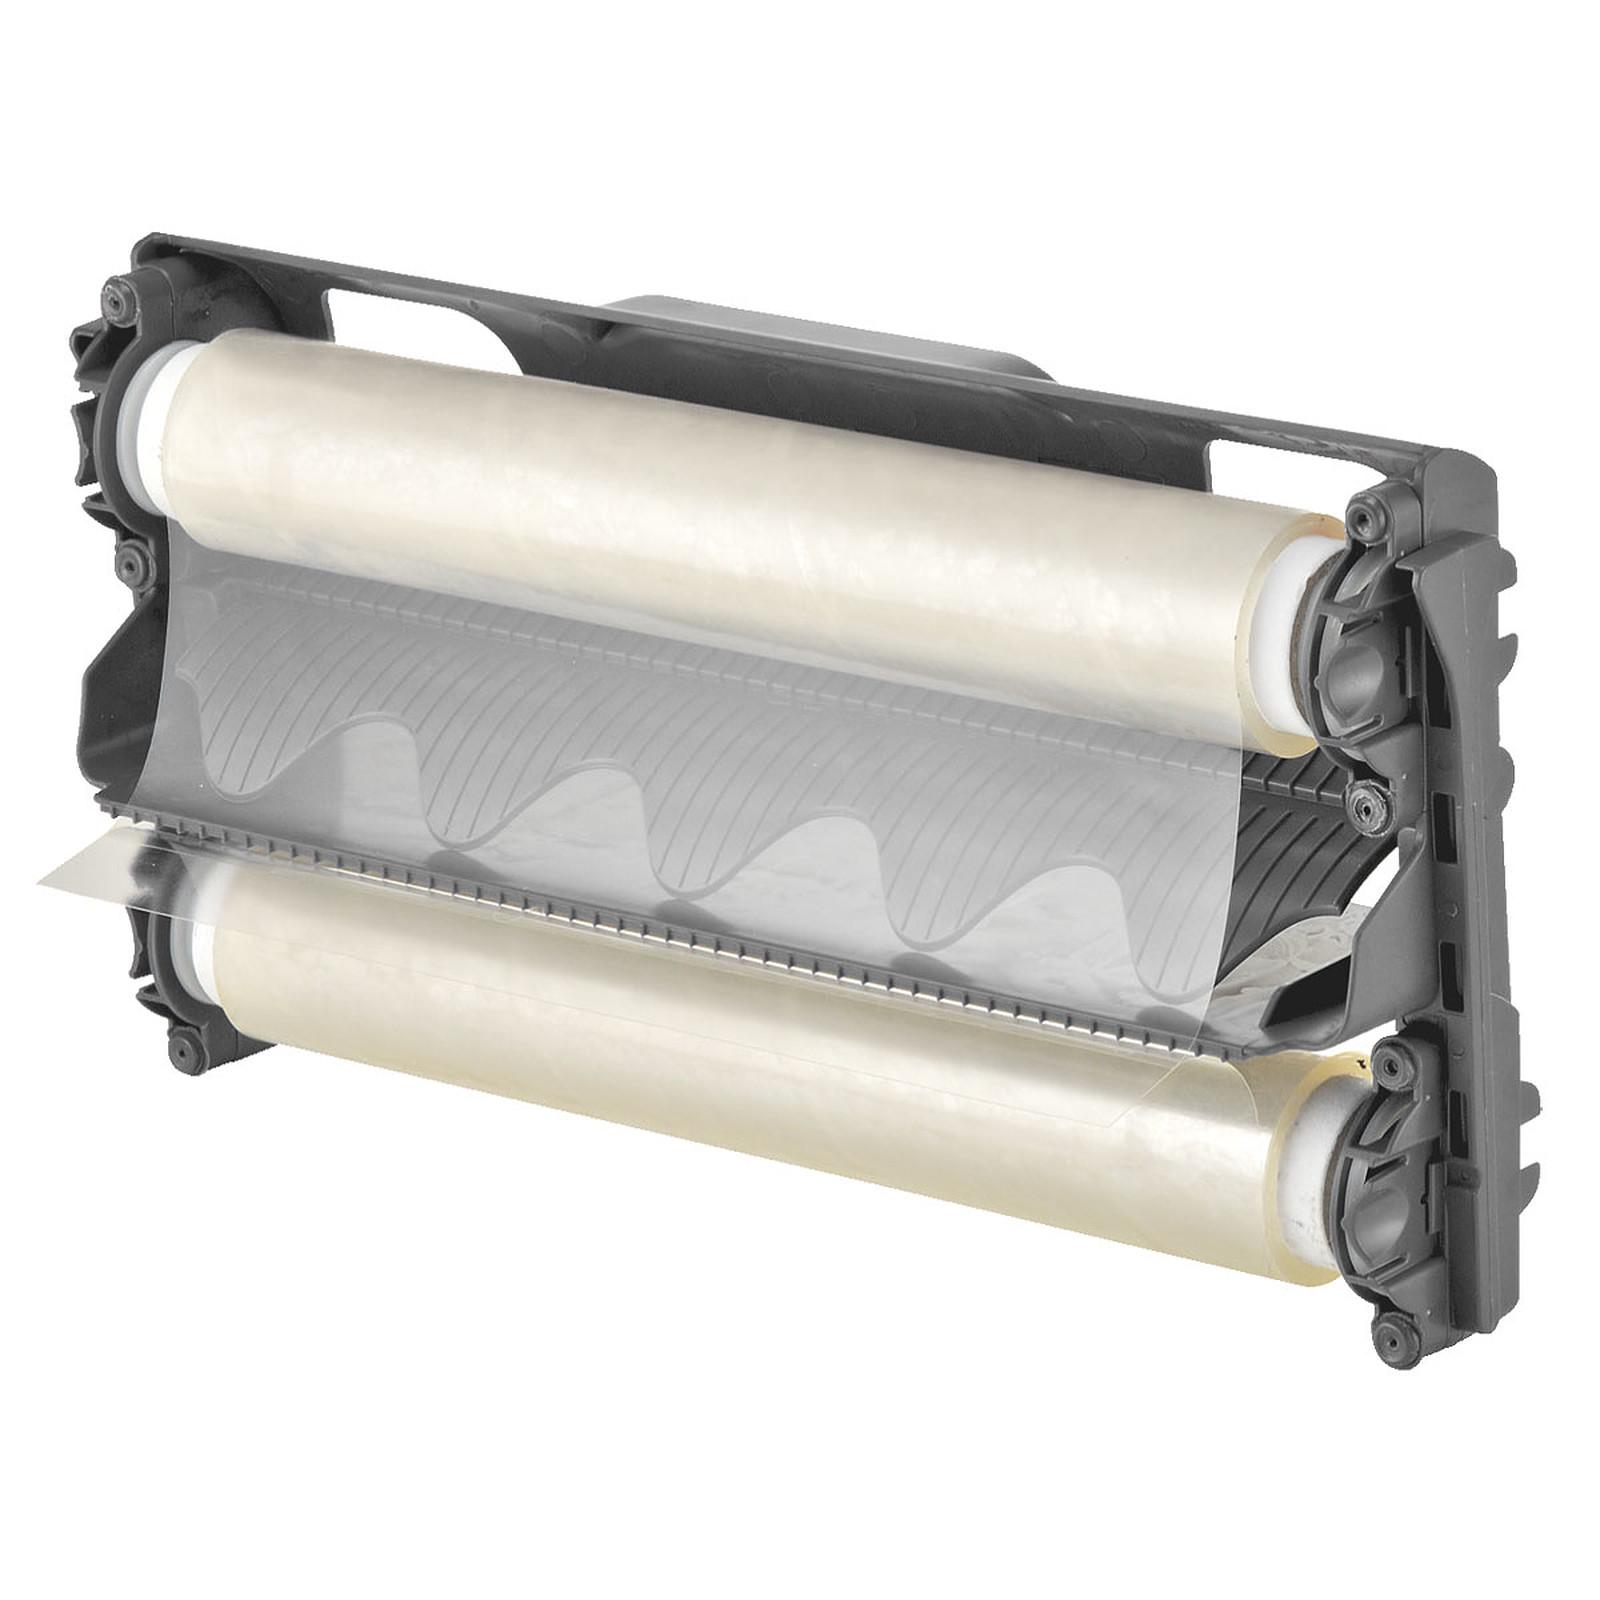 Leitz Cartouche de recharge CS9 - 30 m